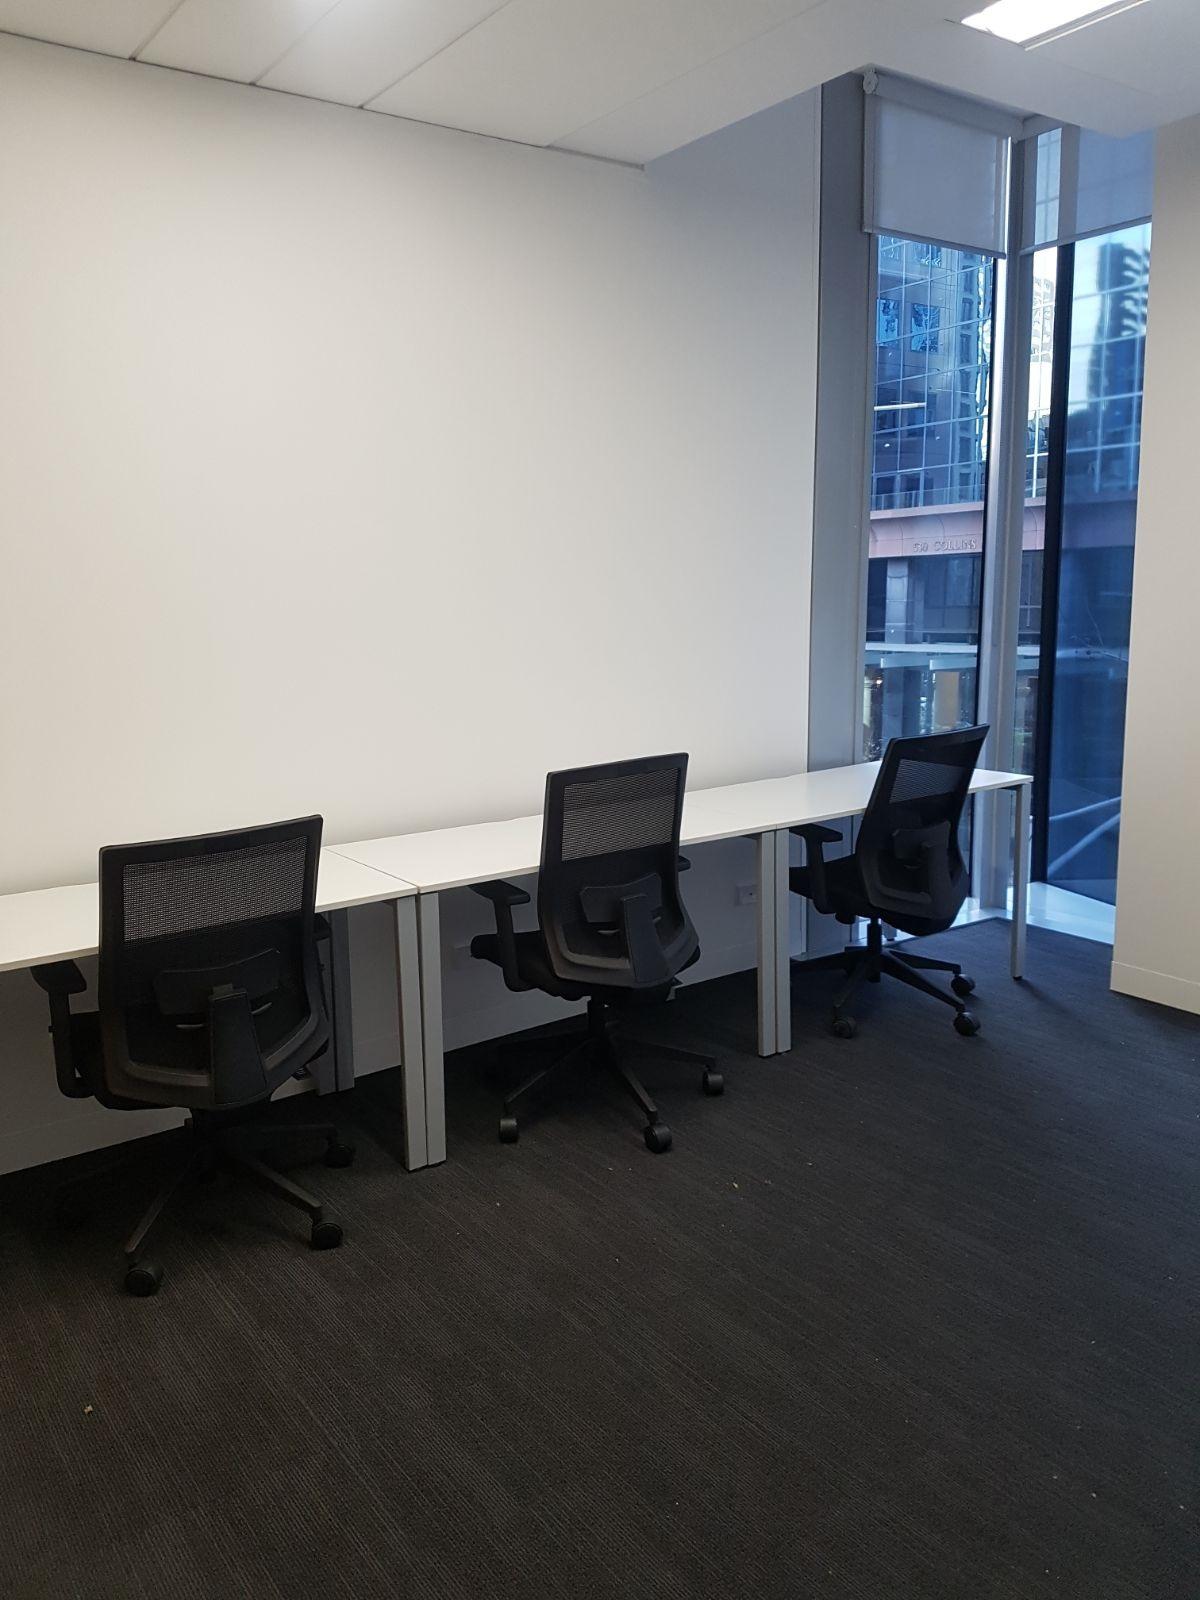 3_SMI Installations_Furniture Installation_IMG-20180717-WA0019.jpg